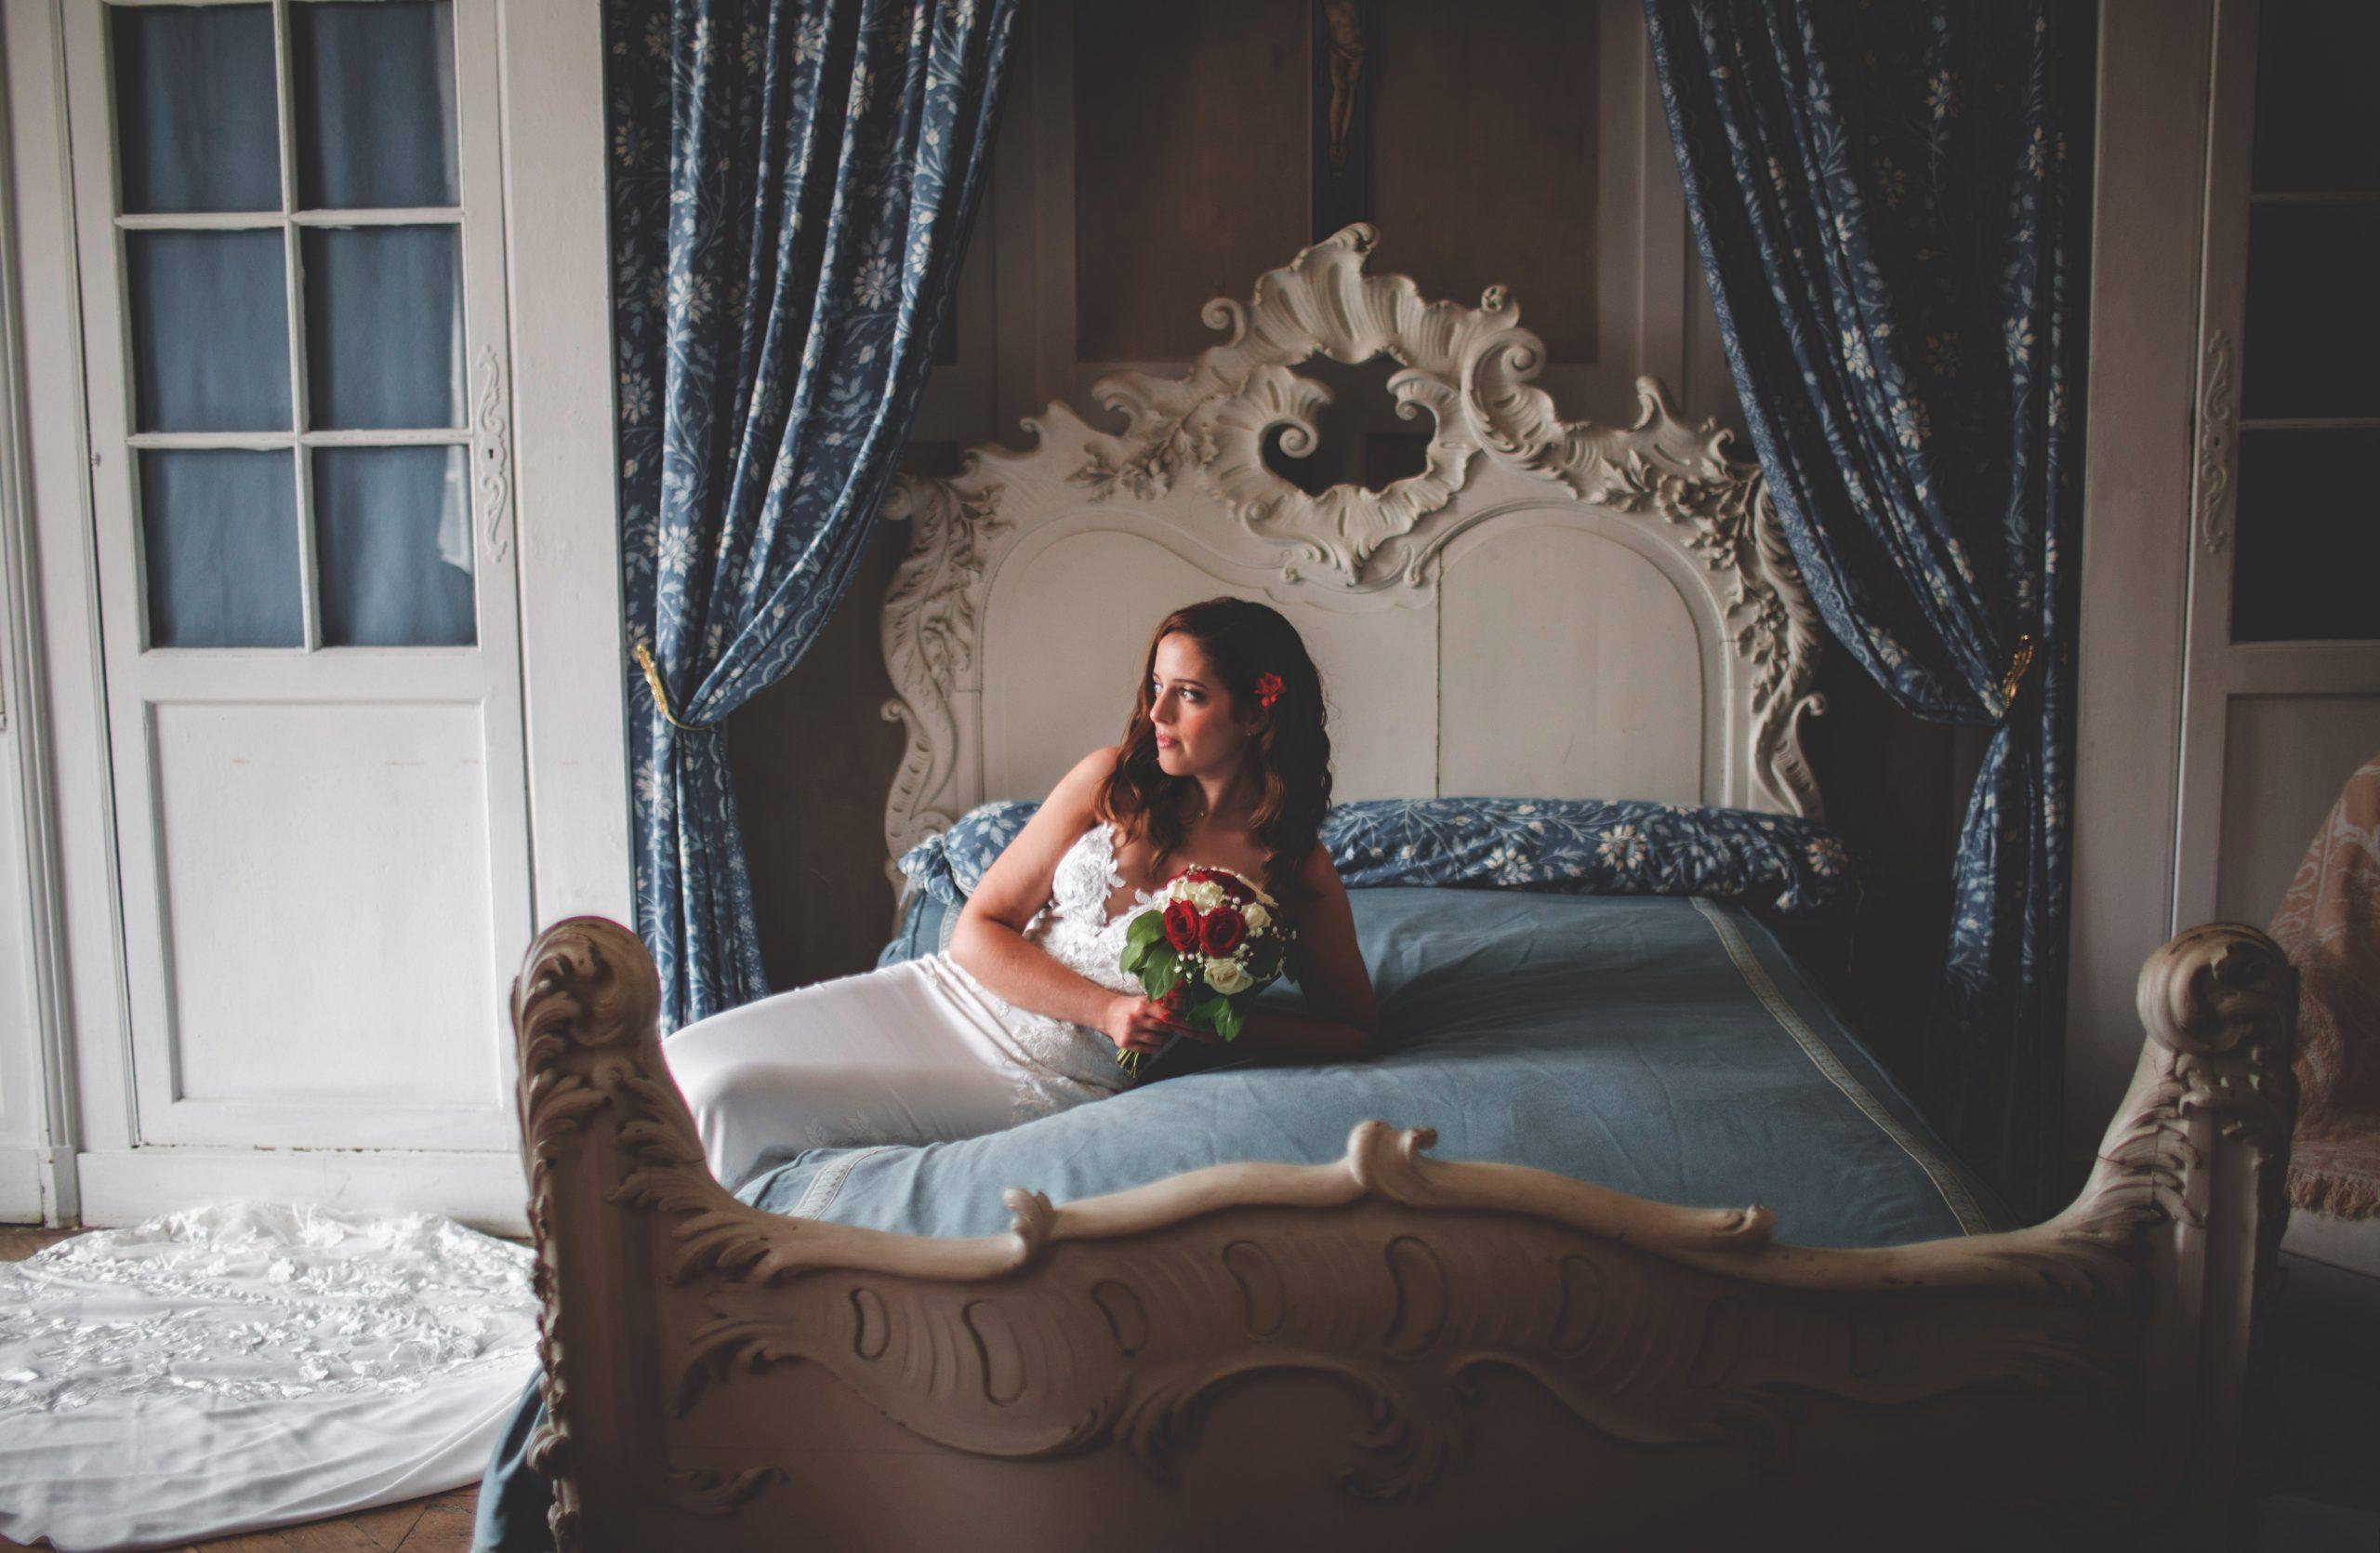 photographe-mariage-au-chateau-de-nandy